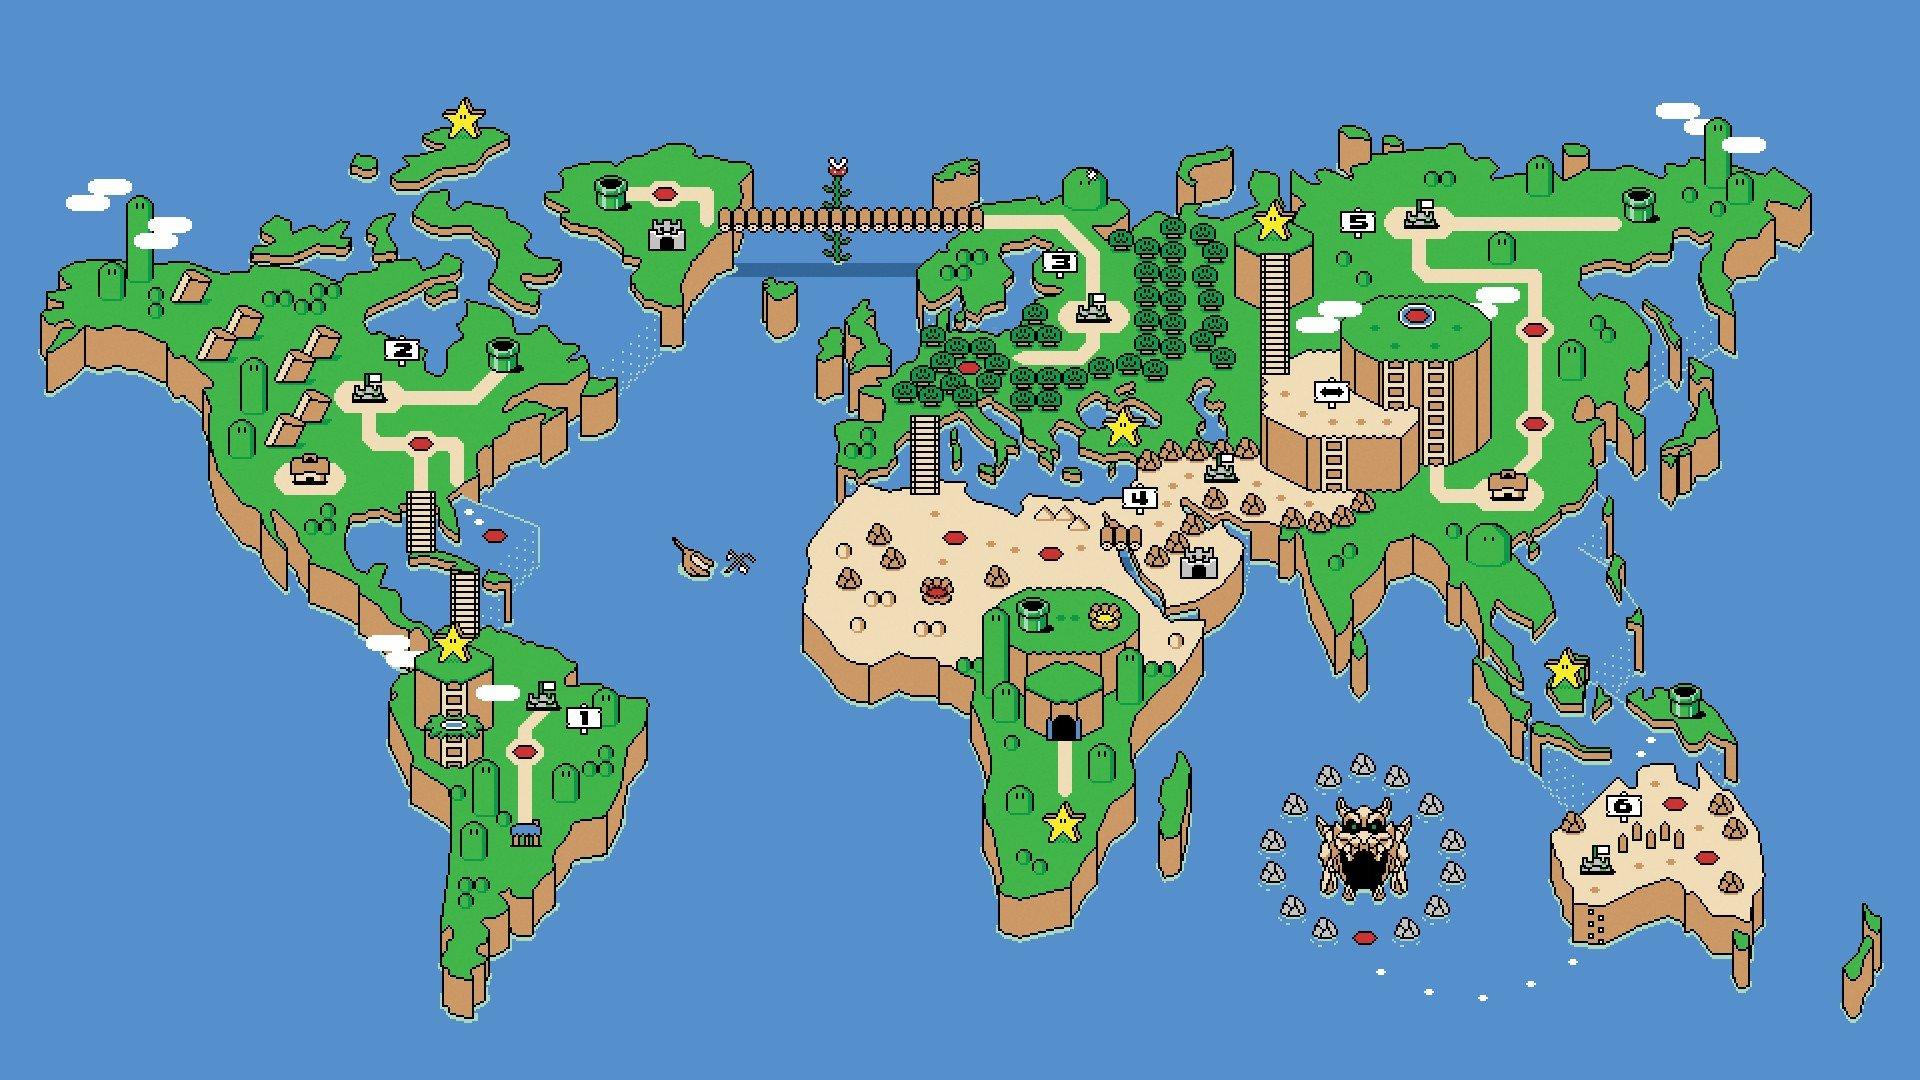 Nintendo Super Mario Fan Art Hd Wallpapers Desktop And Mobile Images Photos